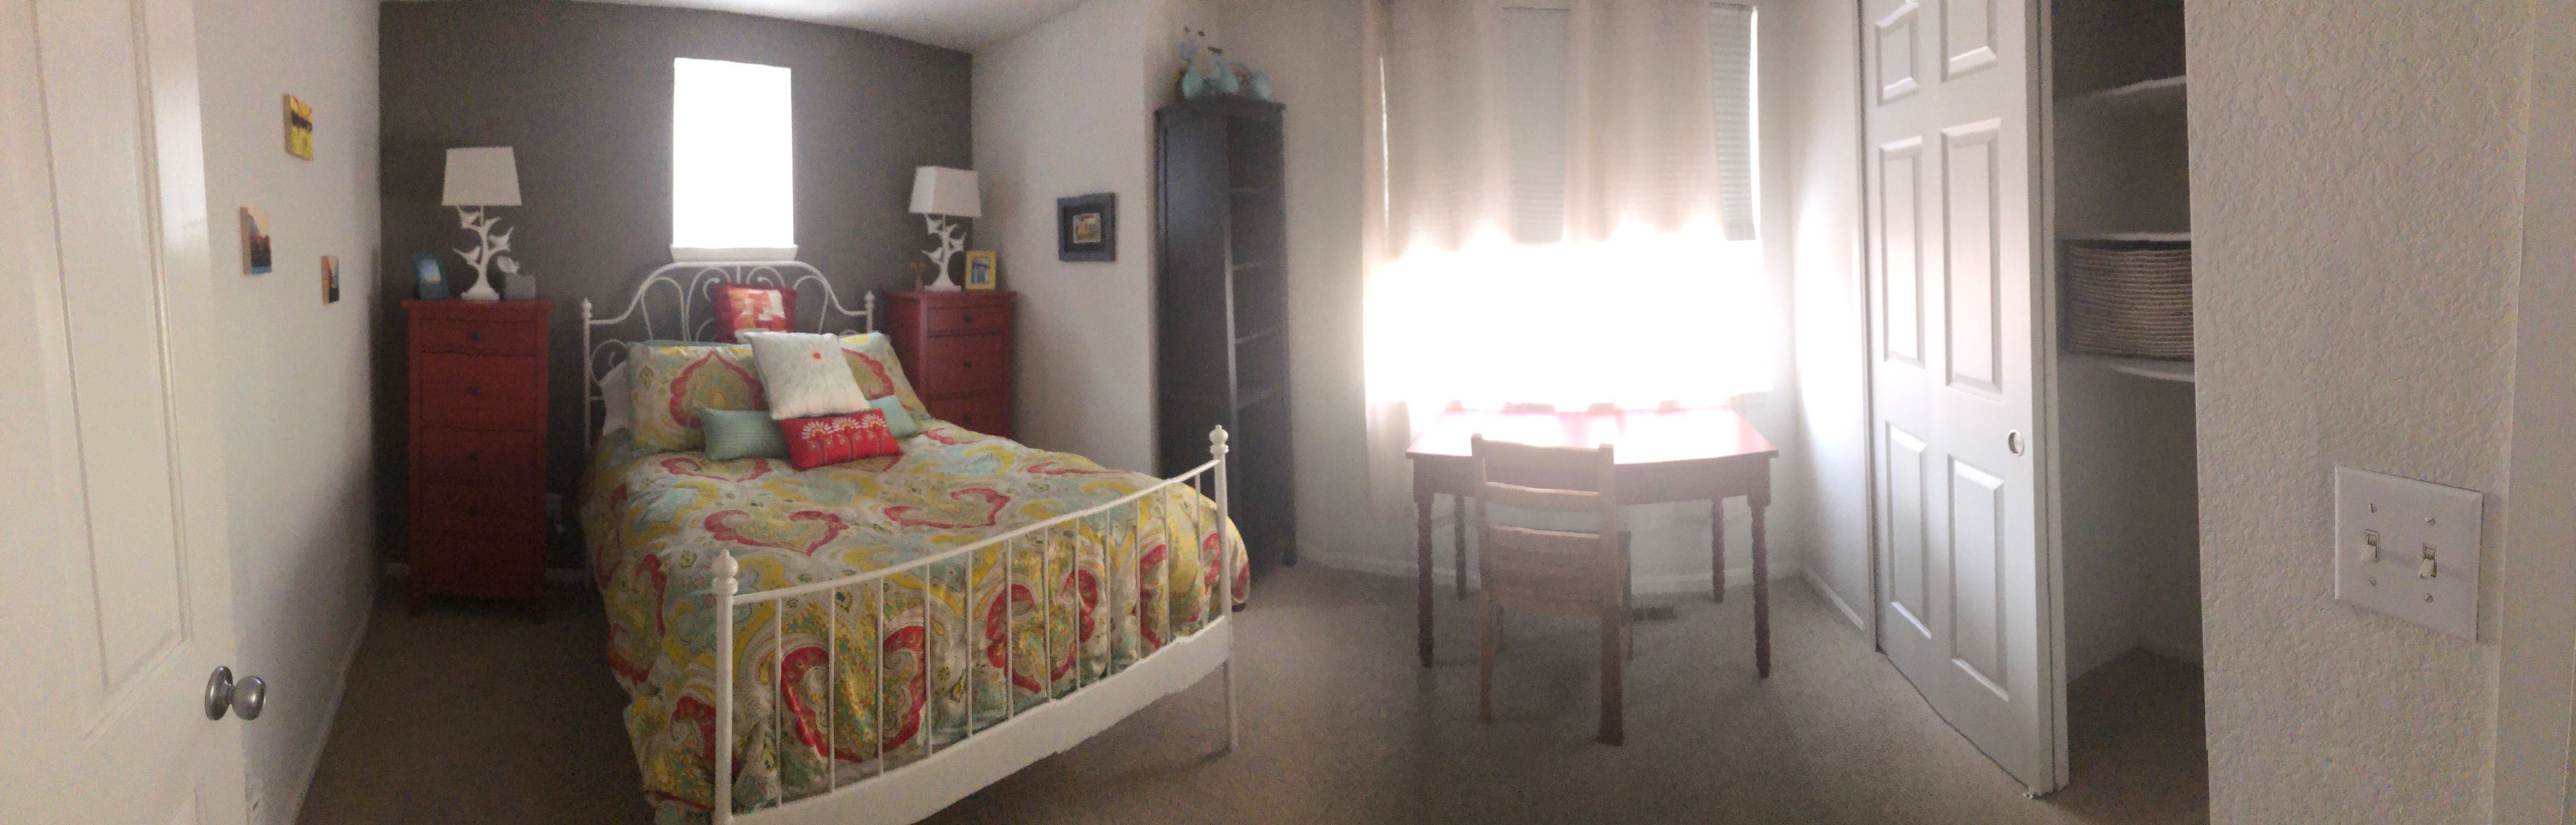 Cozy Room Near Trendy Tennyson - Kopa